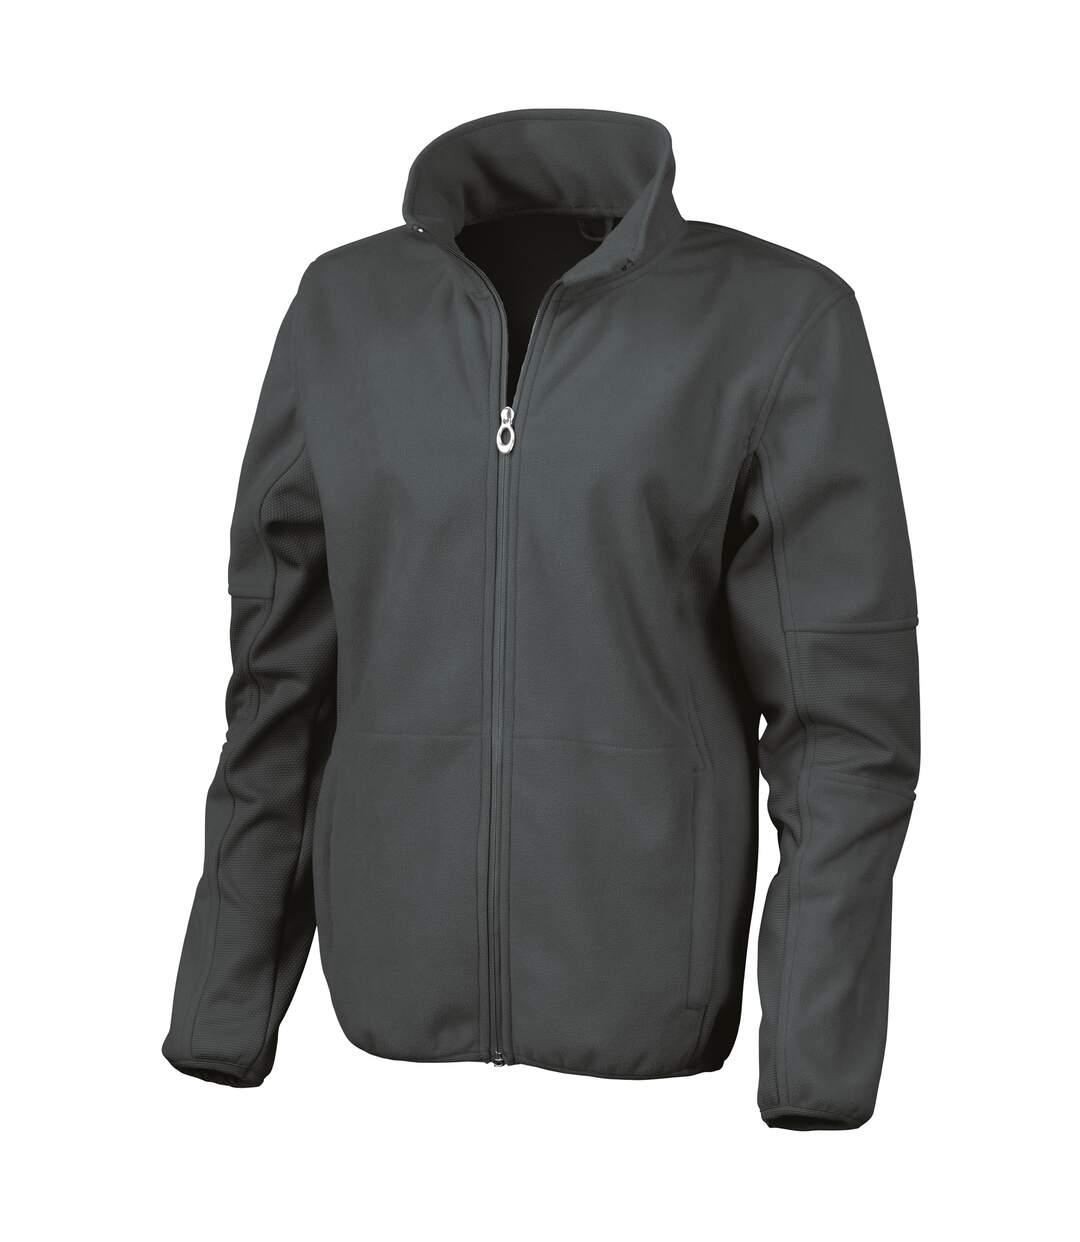 Result Womens/Ladies La Femme® Osaka Combed Pile Softshell Jacket (Waterproof, Windproof And Breathable) (Black) - UTRW3214